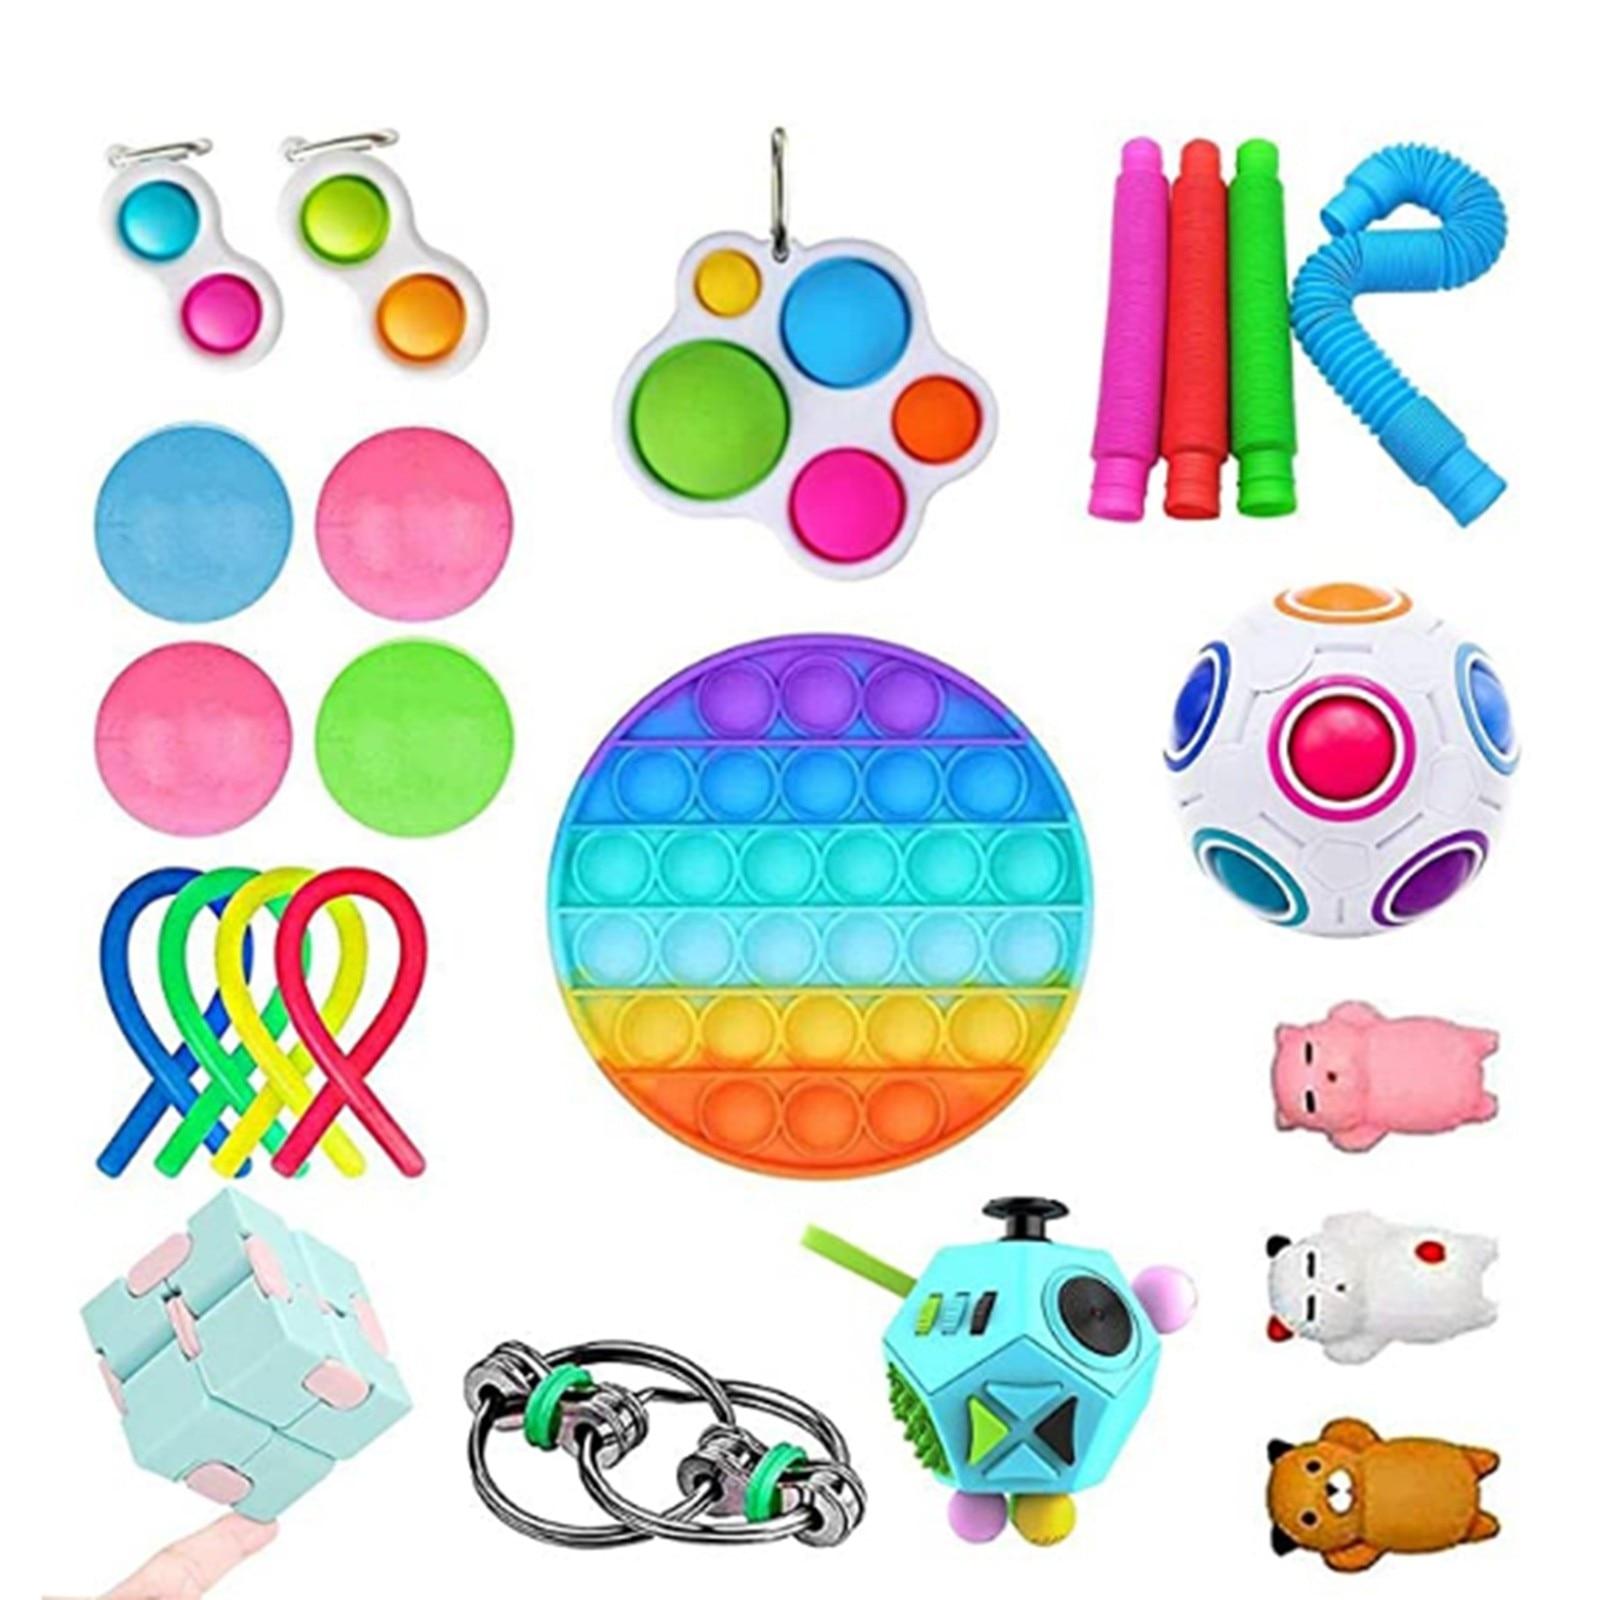 23/25Pcs Fidges Fidget Toy Set Cheap Sensory Fidget Toys Pack for Kids or Adults Squishy Sensory Antistress Relief Figet Toys enlarge